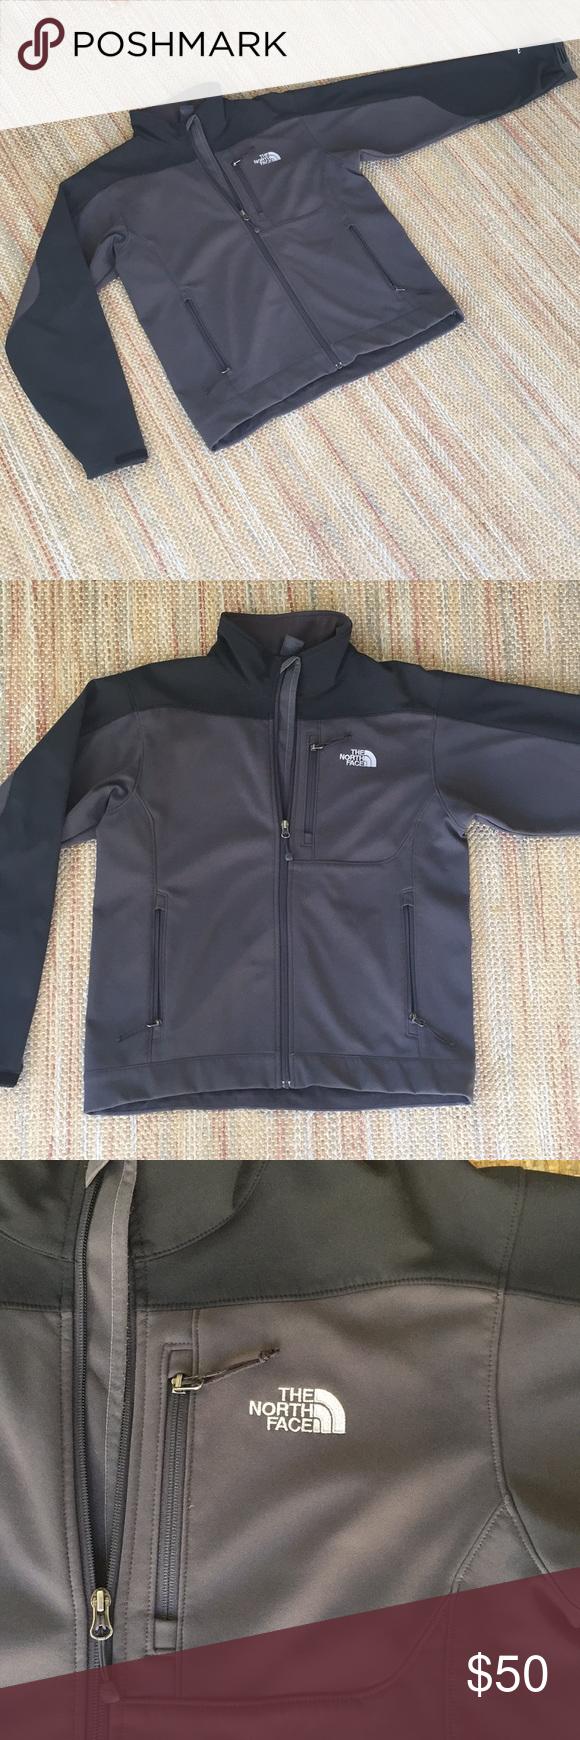 North Face Fleece Lined Shell Jacket Men S M North Face Fleece Shell Jacket Mens Jackets [ 1740 x 580 Pixel ]